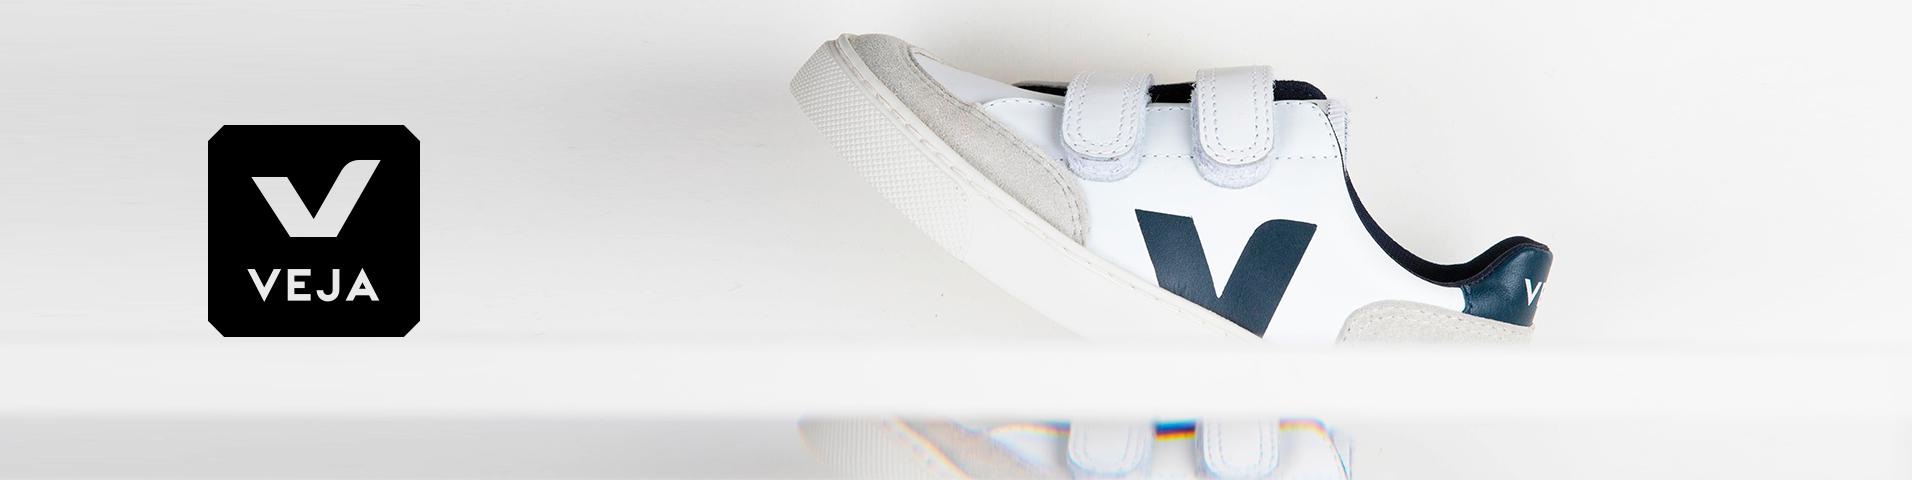 Veja Online-Shop   Veja versandkostenfrei bei Zalando.ch e55b0bb7de